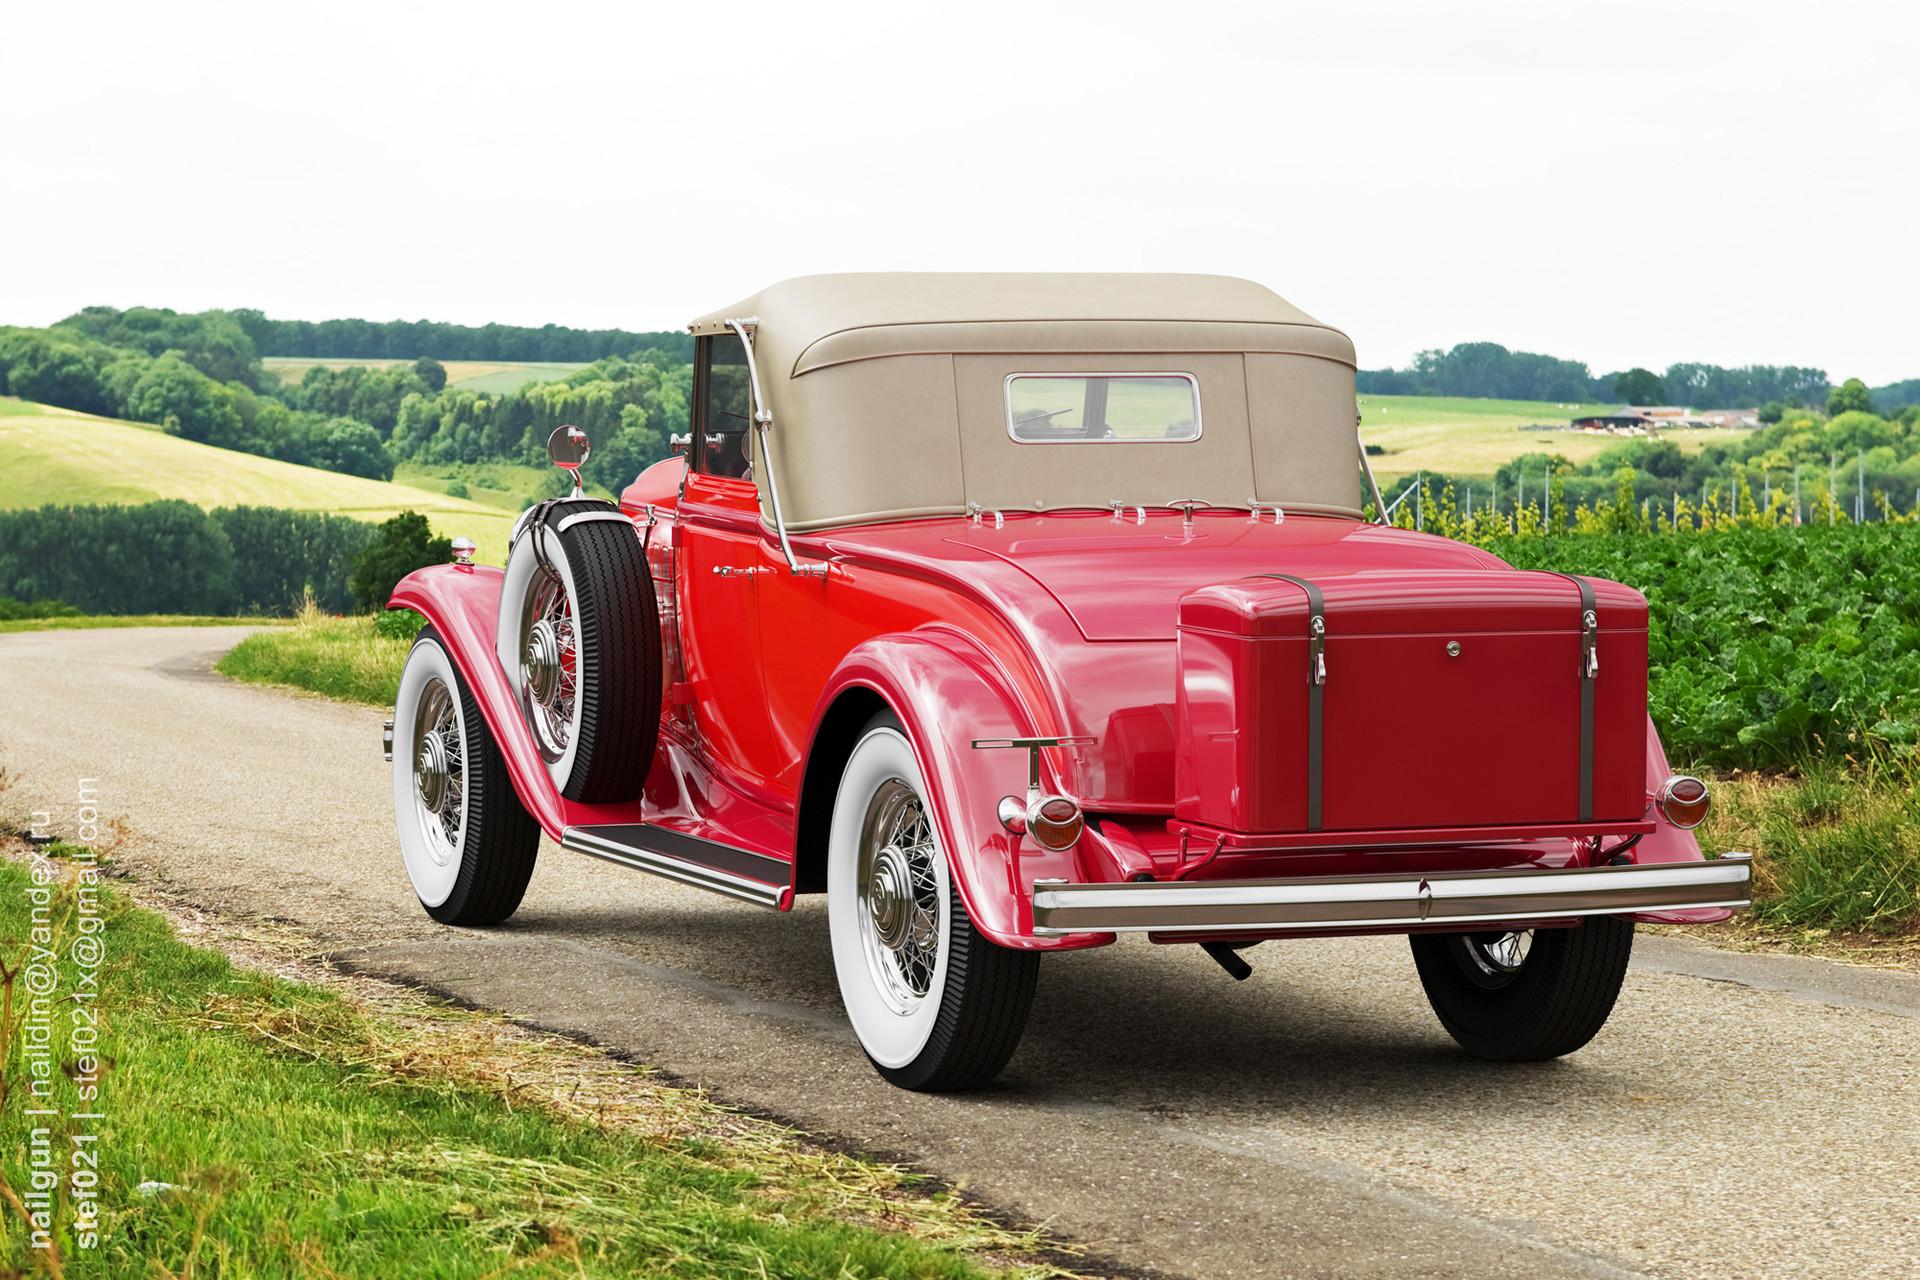 Nail khusnutdinov a0002 buick 96s 1932 roof up back rox